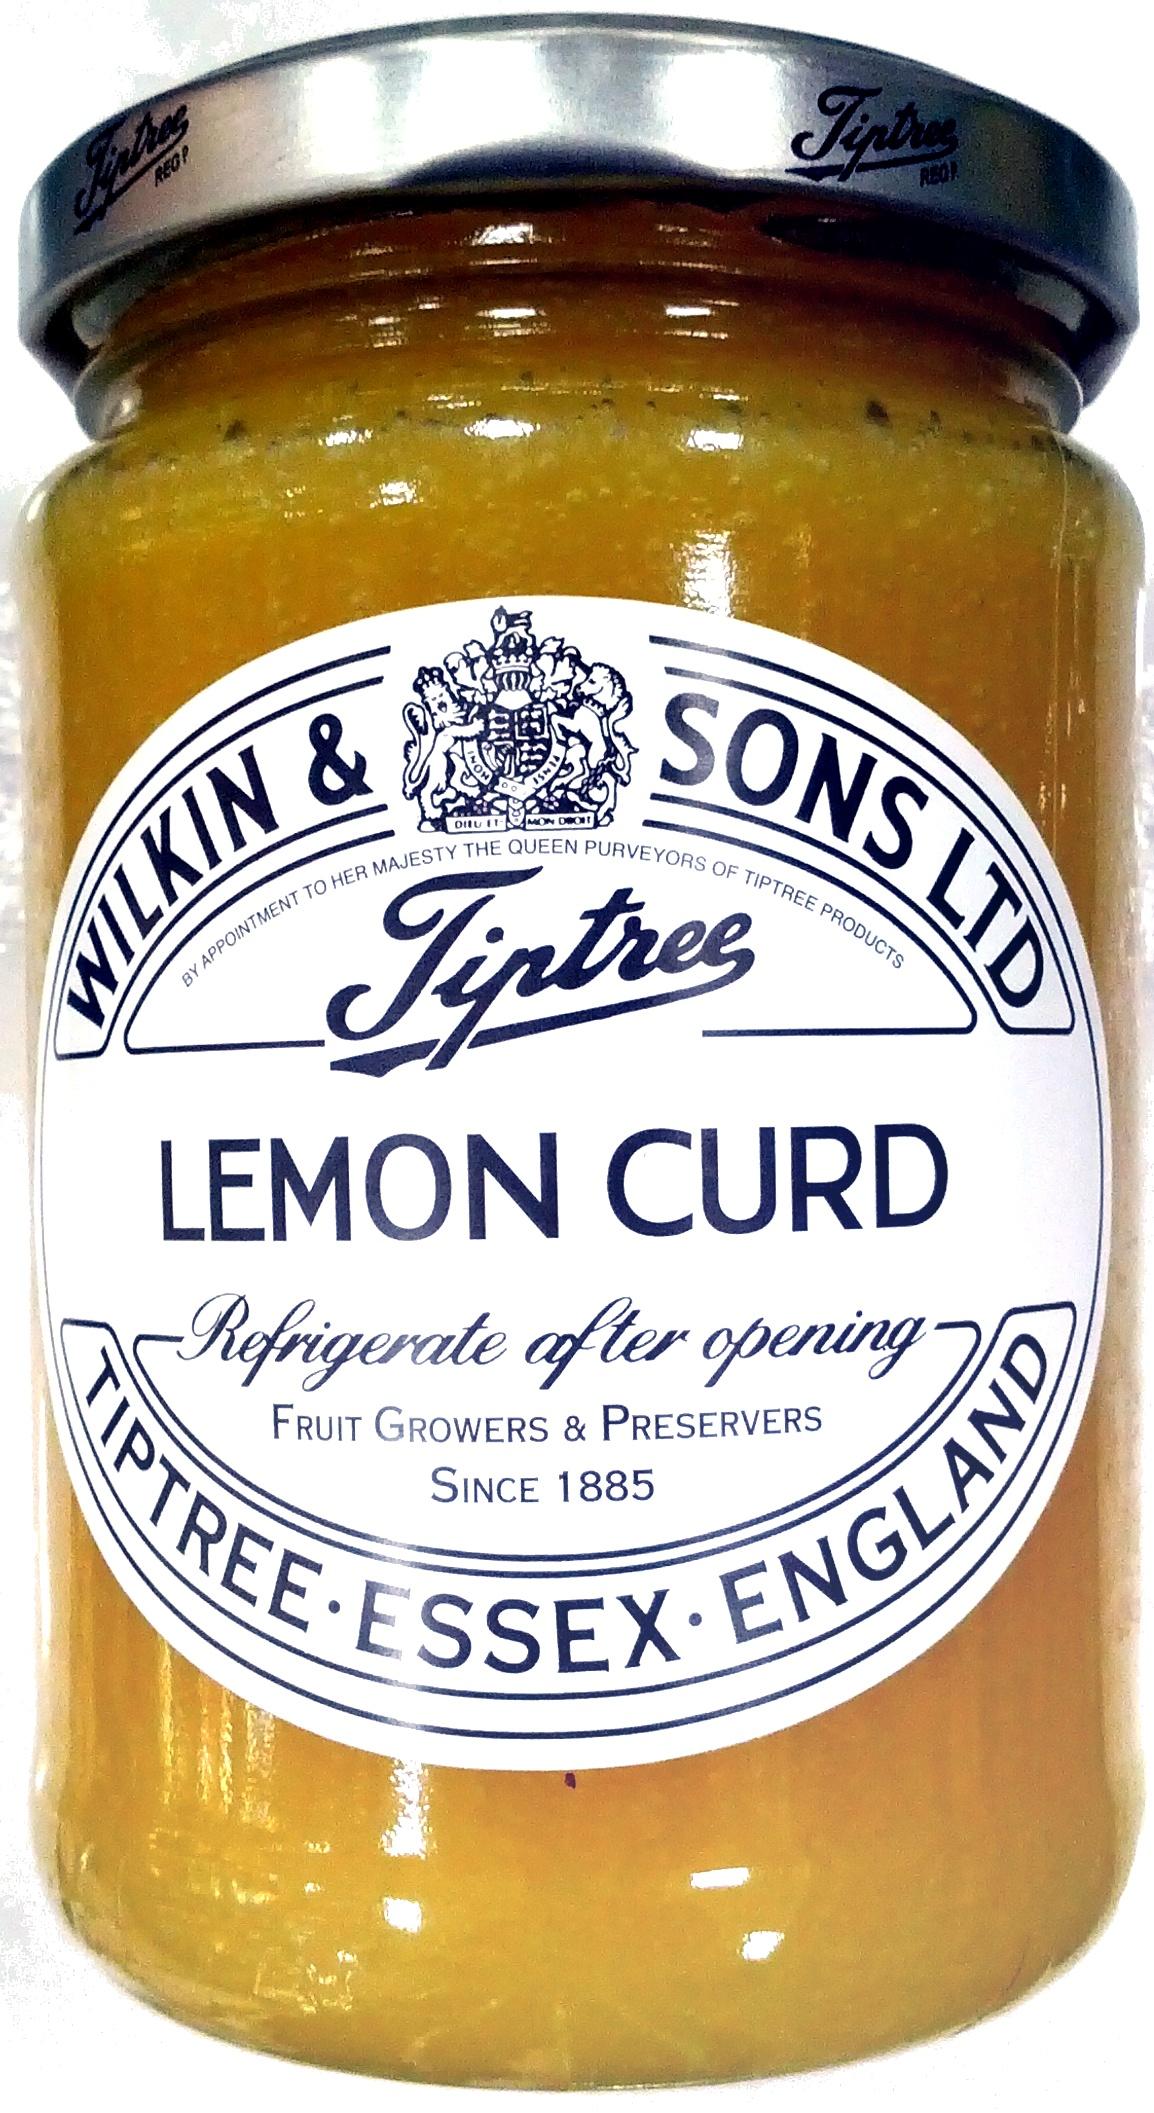 Chip tory lemon curd - Product - en